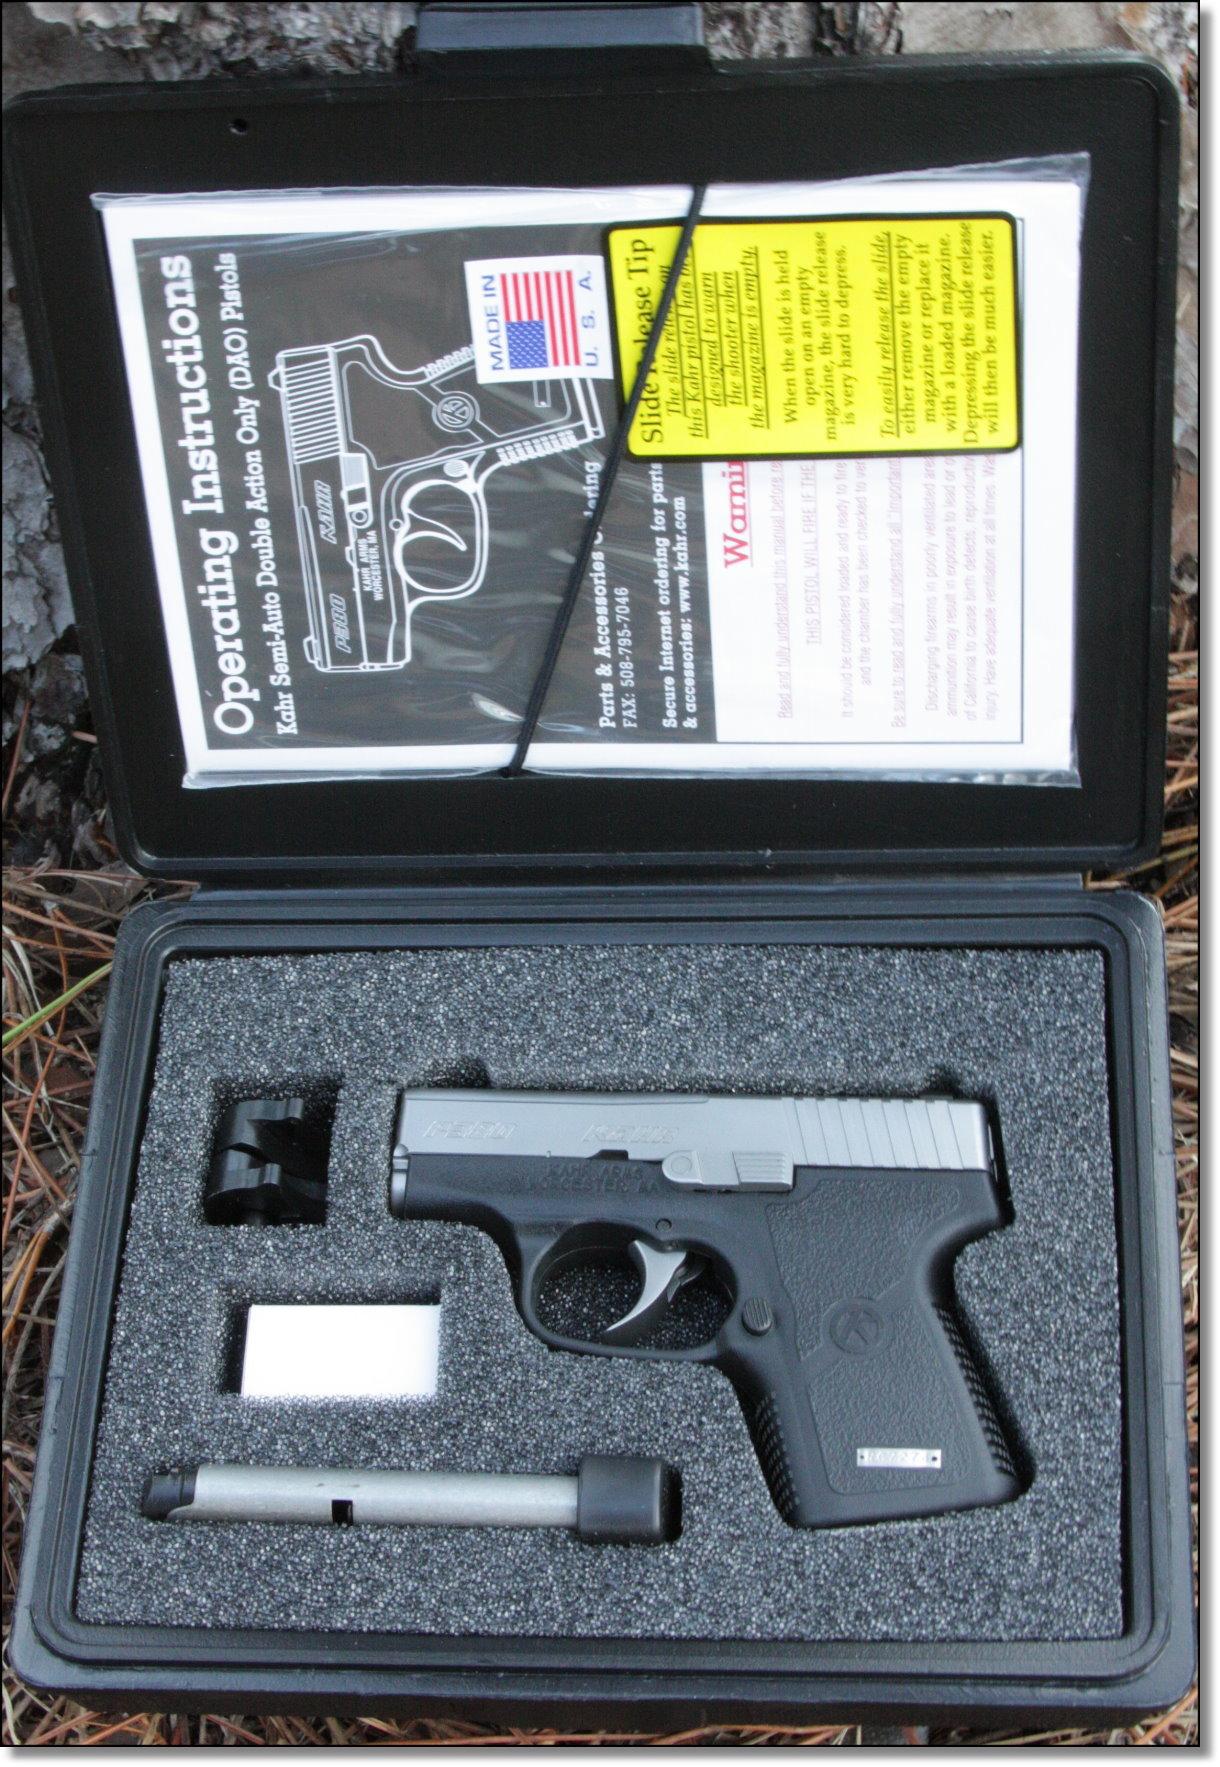 Kahr P380 - The Best Tiny Pocket 380 - GunsAmerica Digest